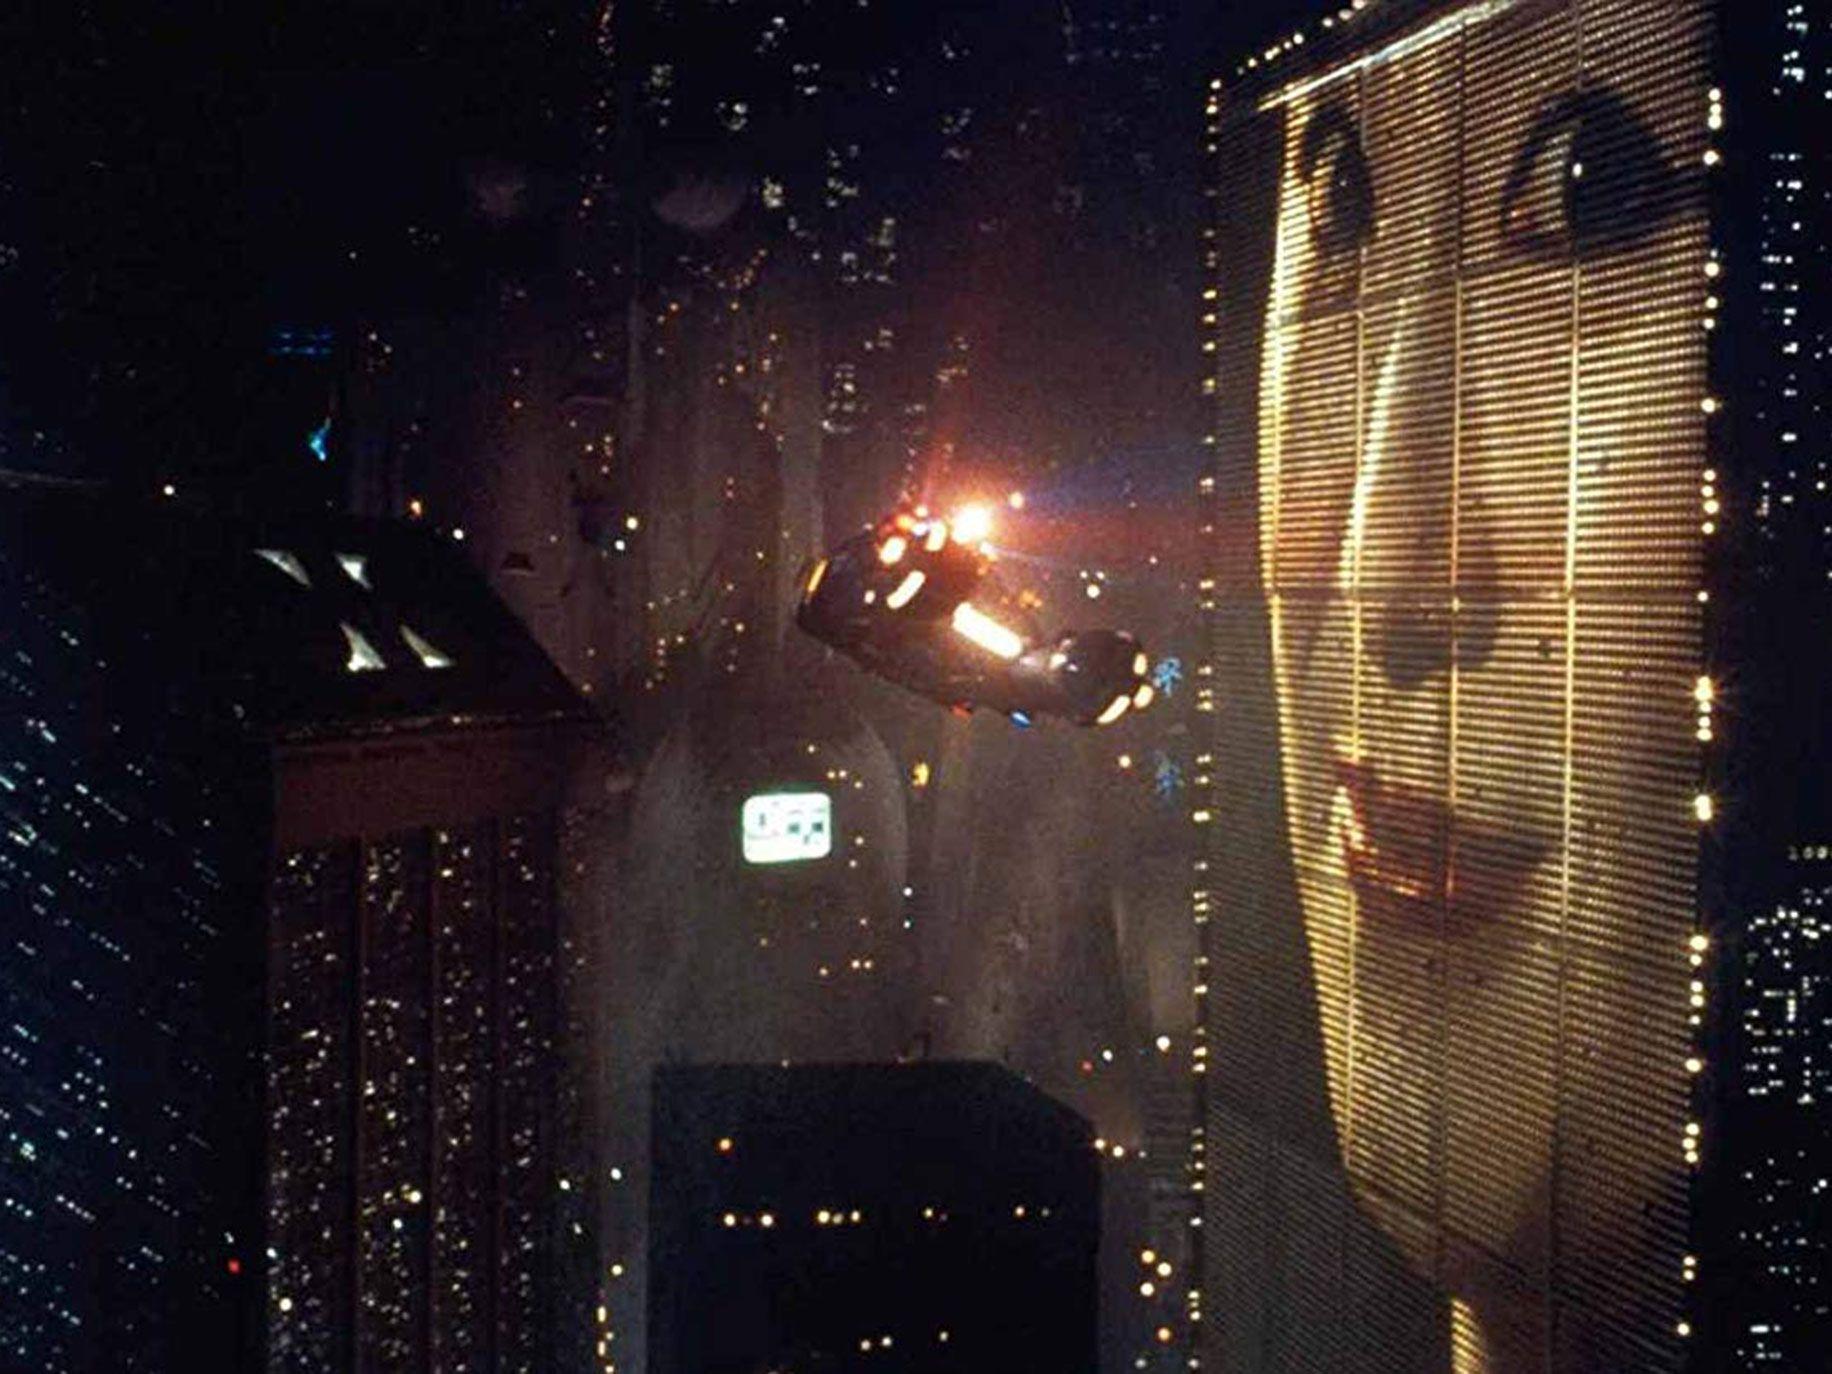 Scene from Blade Runner showing giant billboard.